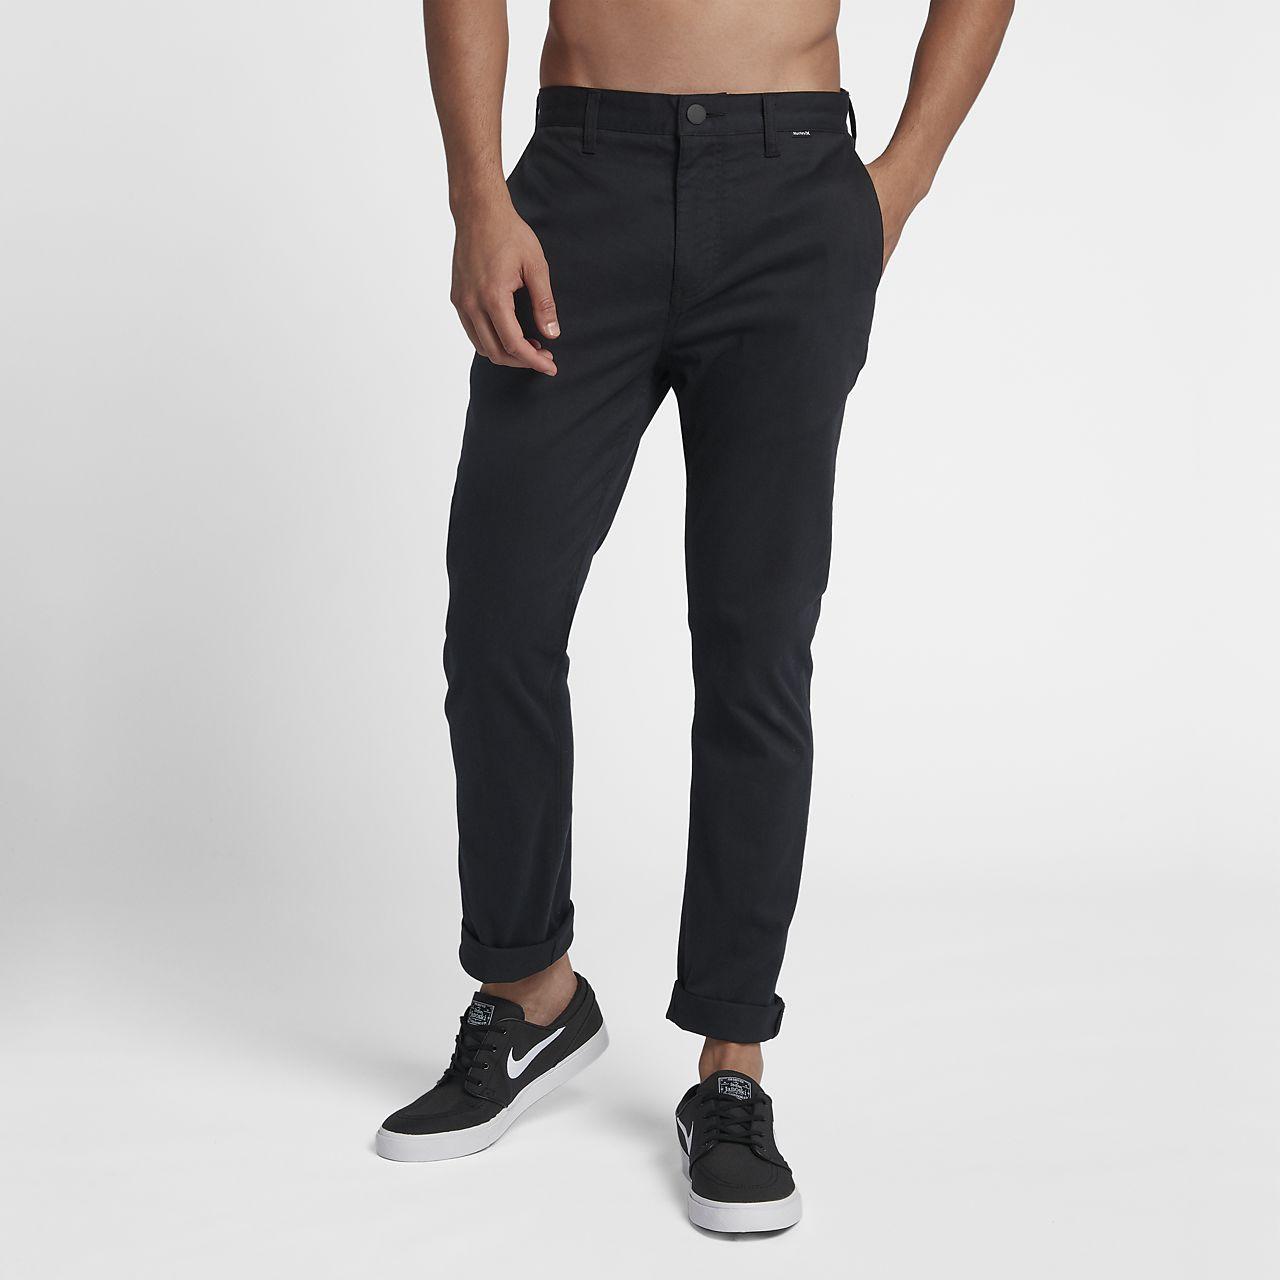 Hurley Dri-FIT Worker Men's Trousers